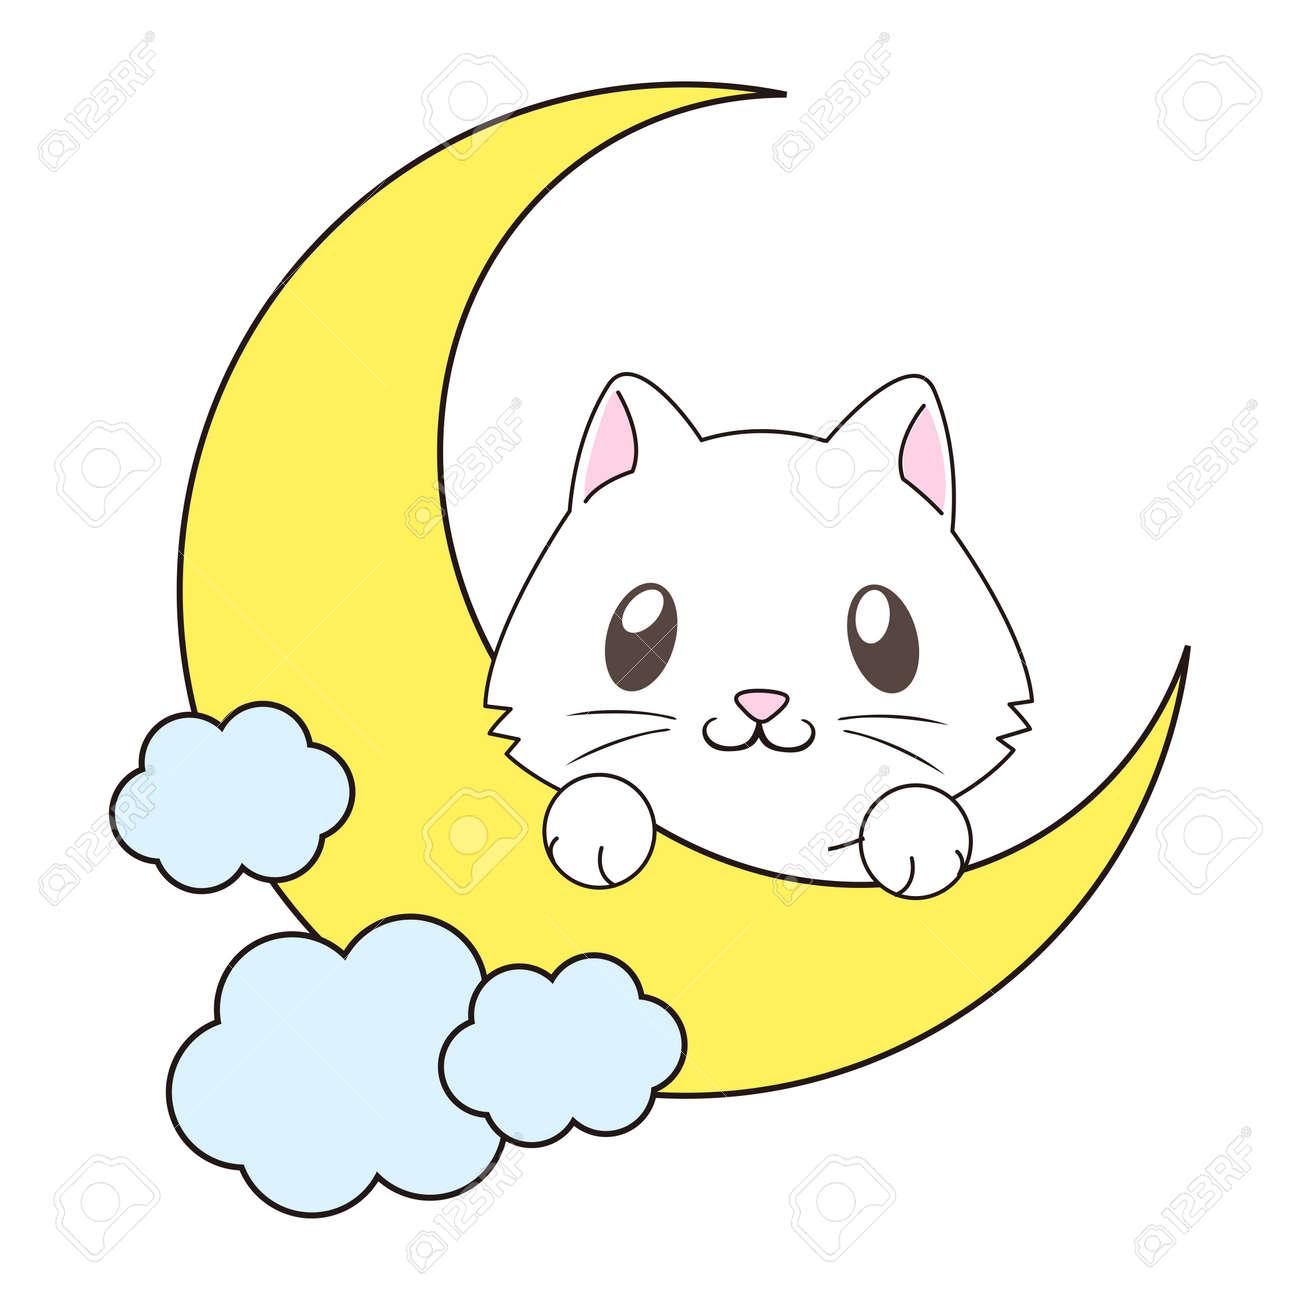 vector cute cartoon cat on the moon illustration royalty free rh 123rf com cartoon cat images black and white cartoon cat images free download